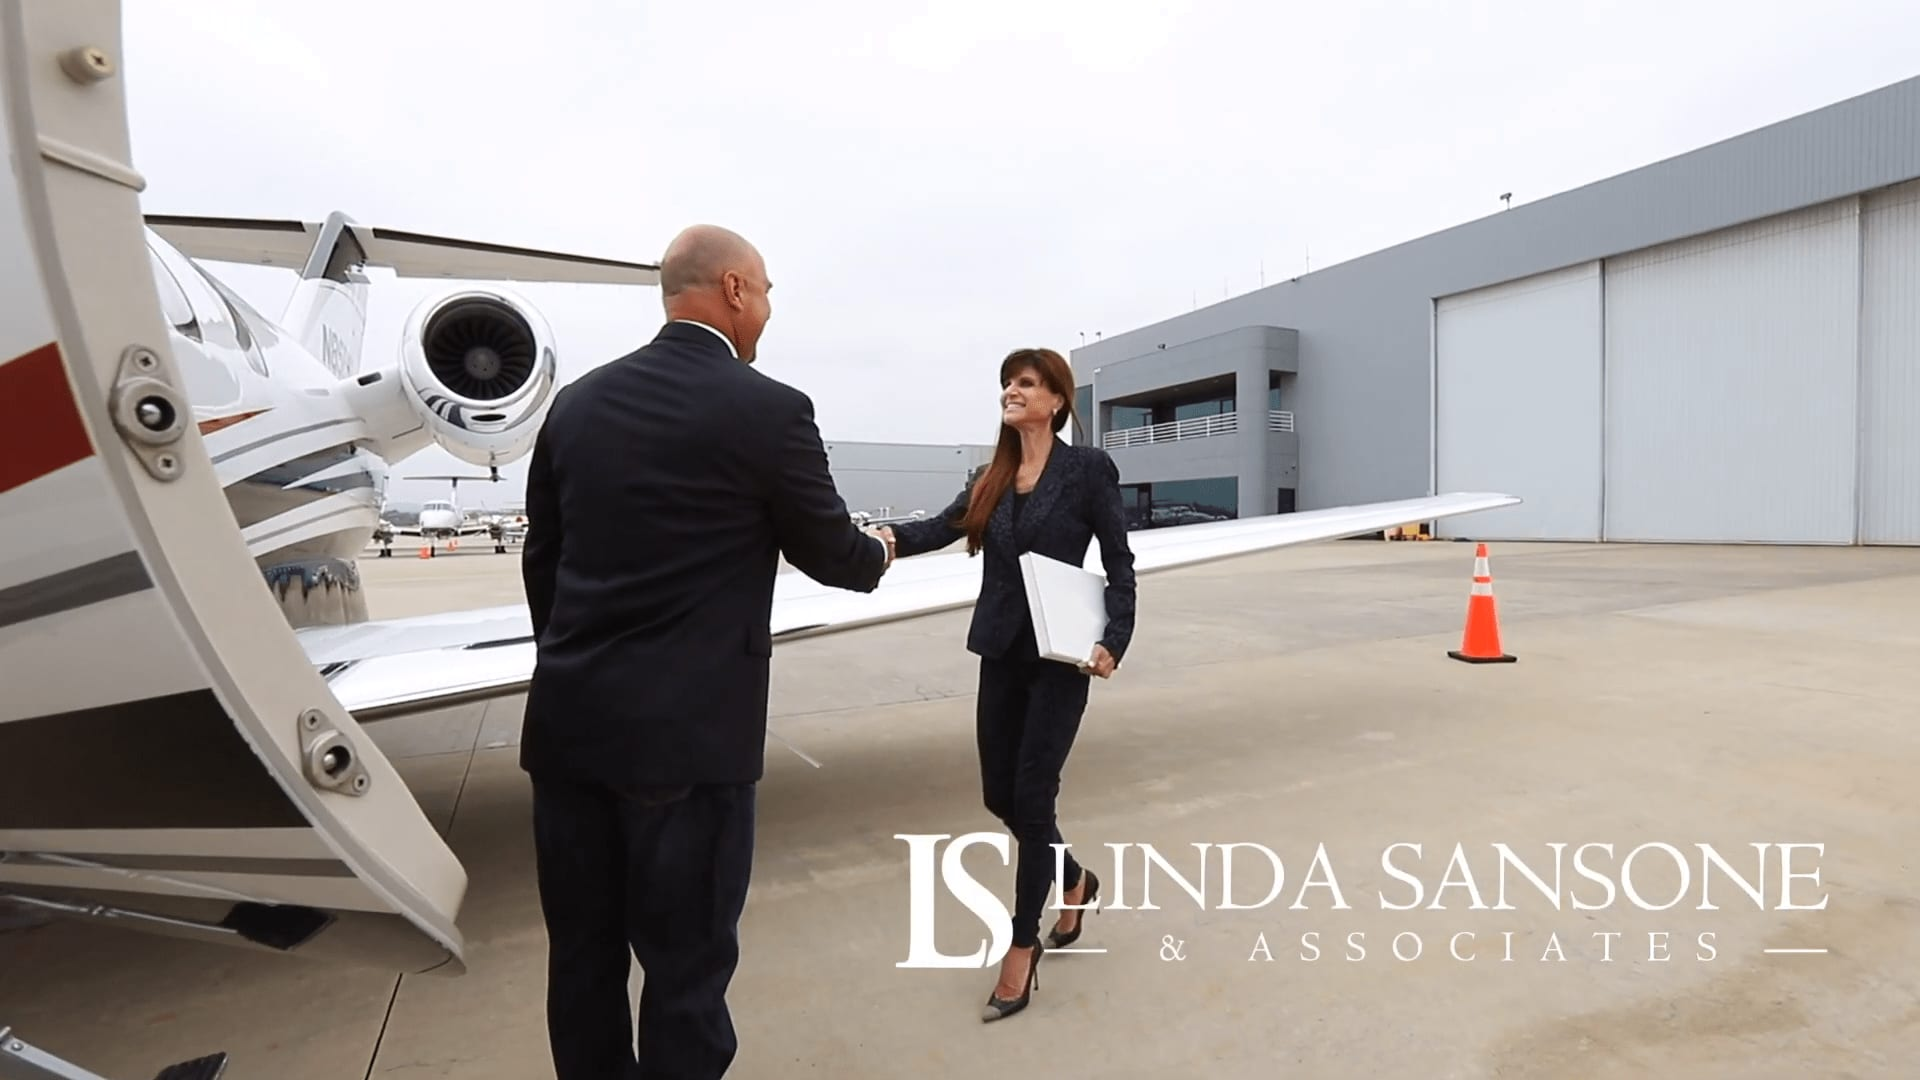 Jet Set Linda Sansone & Associates video preview